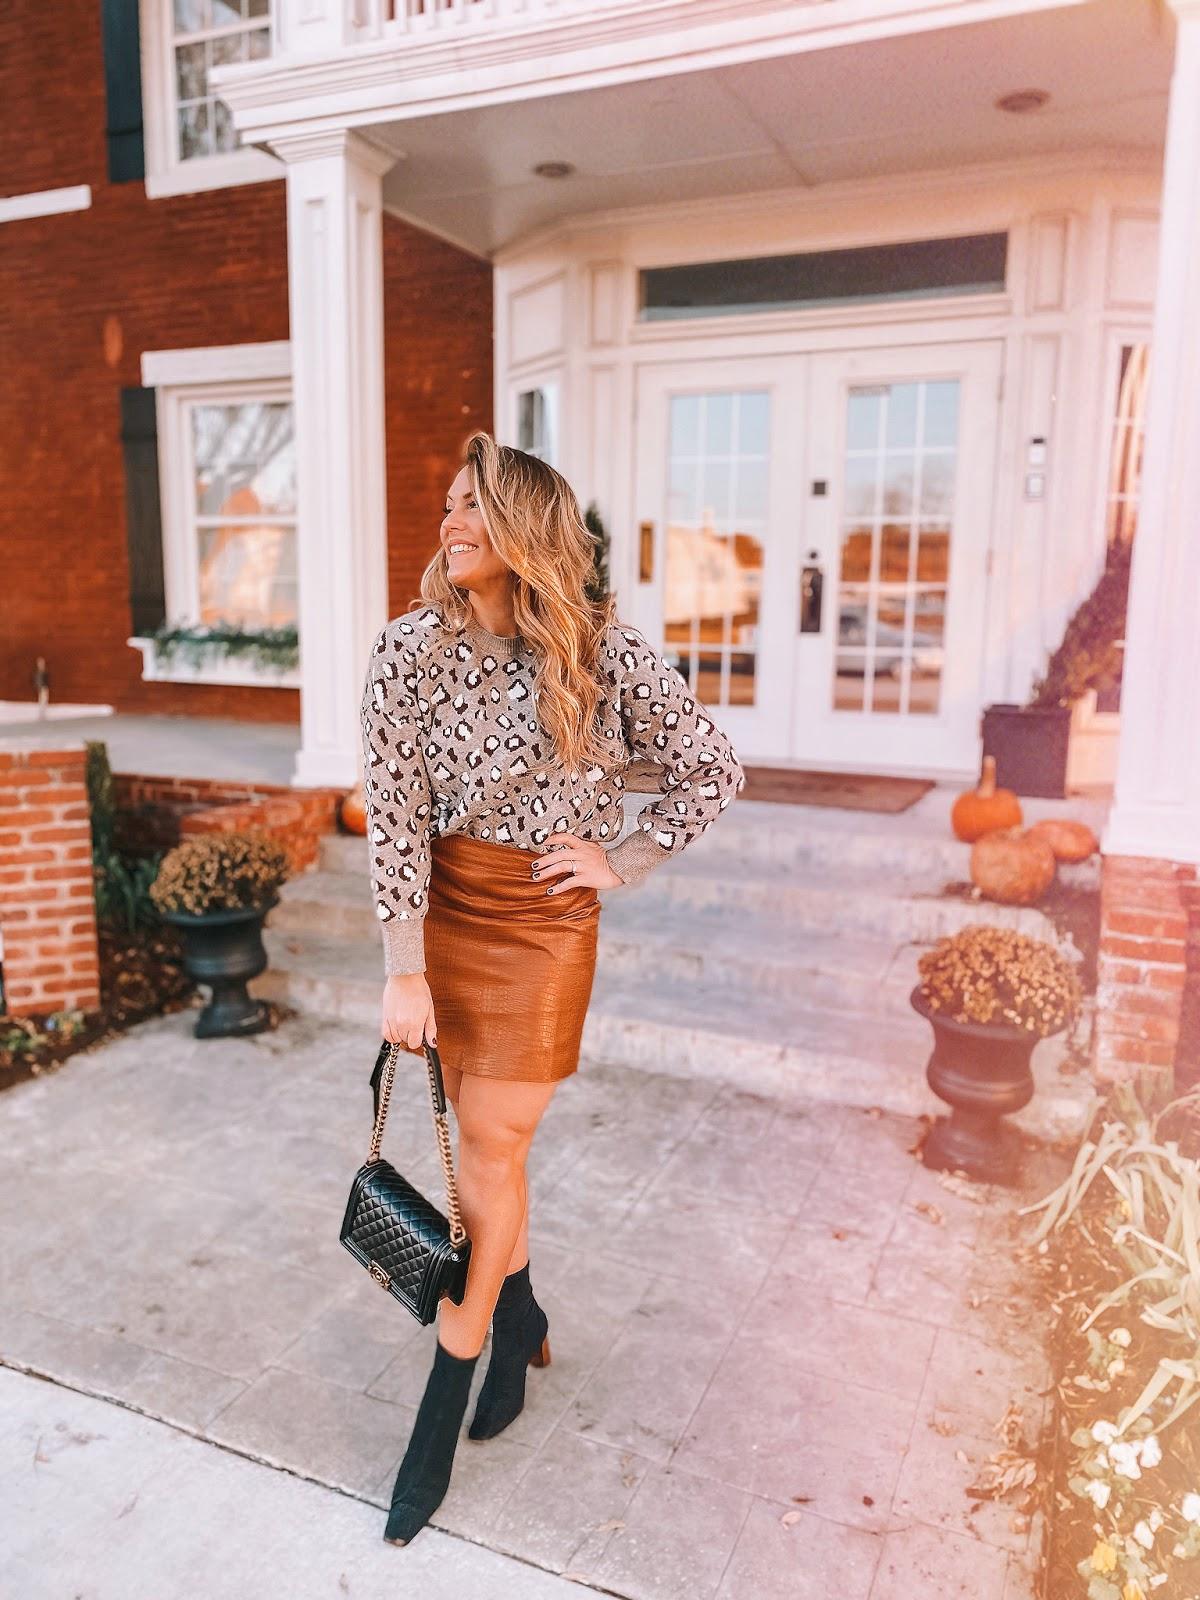 Oklahoma City blogger Amanda's OK wears a grey leopard sweater and a tan leather mini skirt